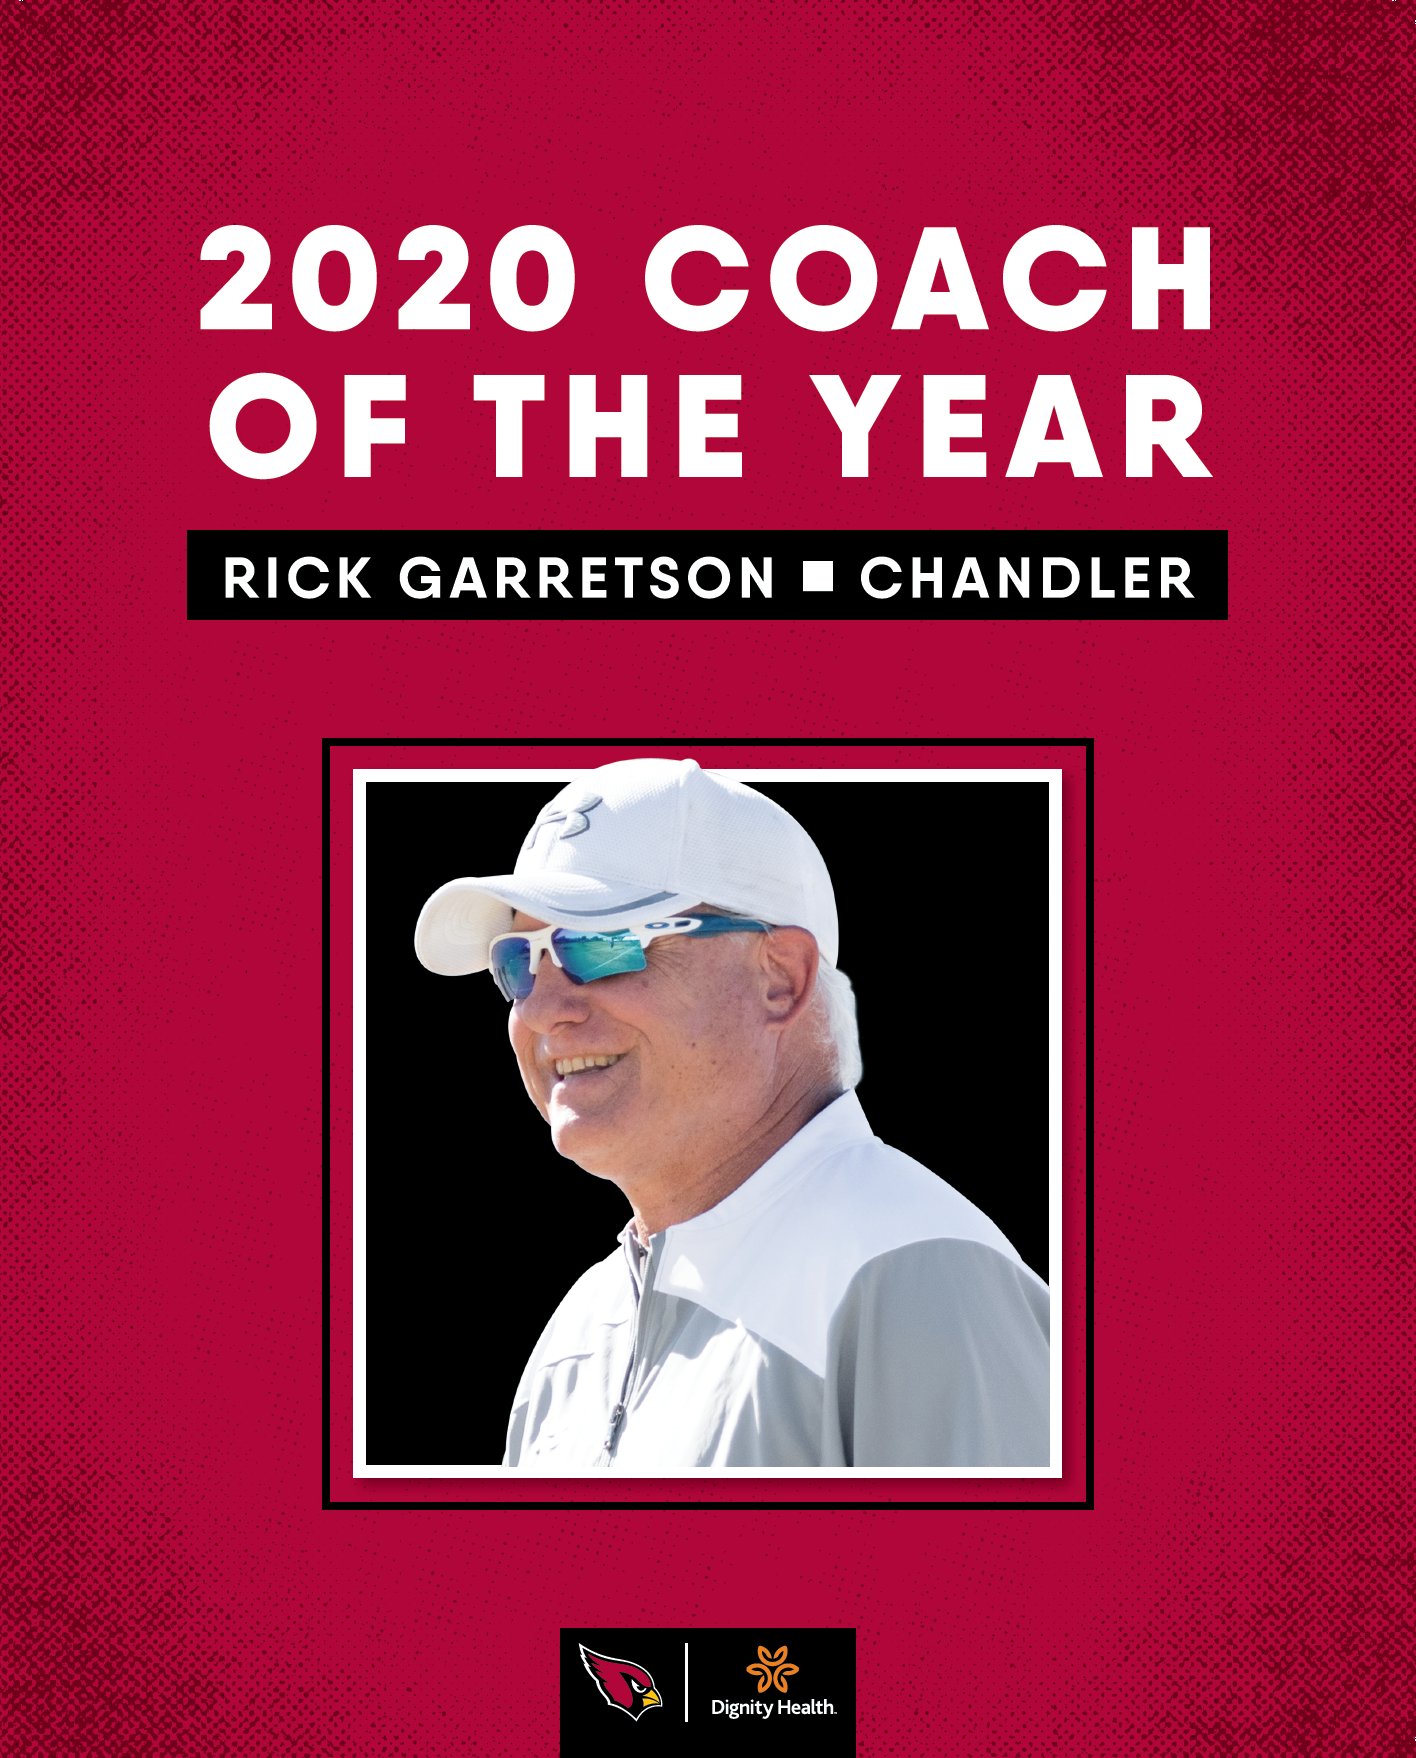 Rick Garretson Coach of the Year